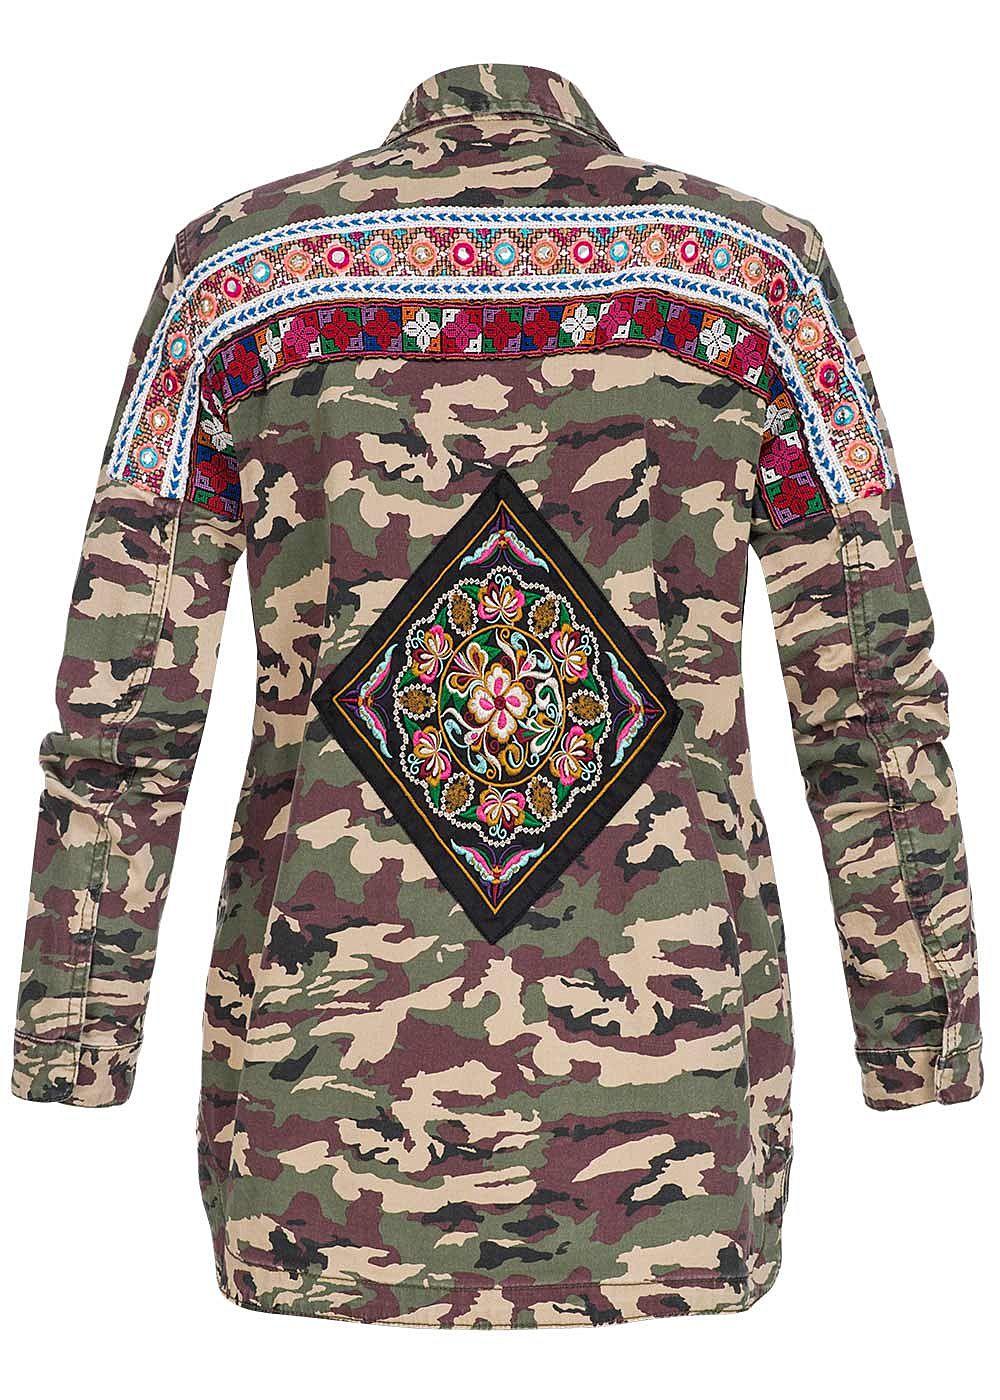 only damen bergangsjacke patches deko steine camouflage design kalamata camouflage 77onlineshop. Black Bedroom Furniture Sets. Home Design Ideas